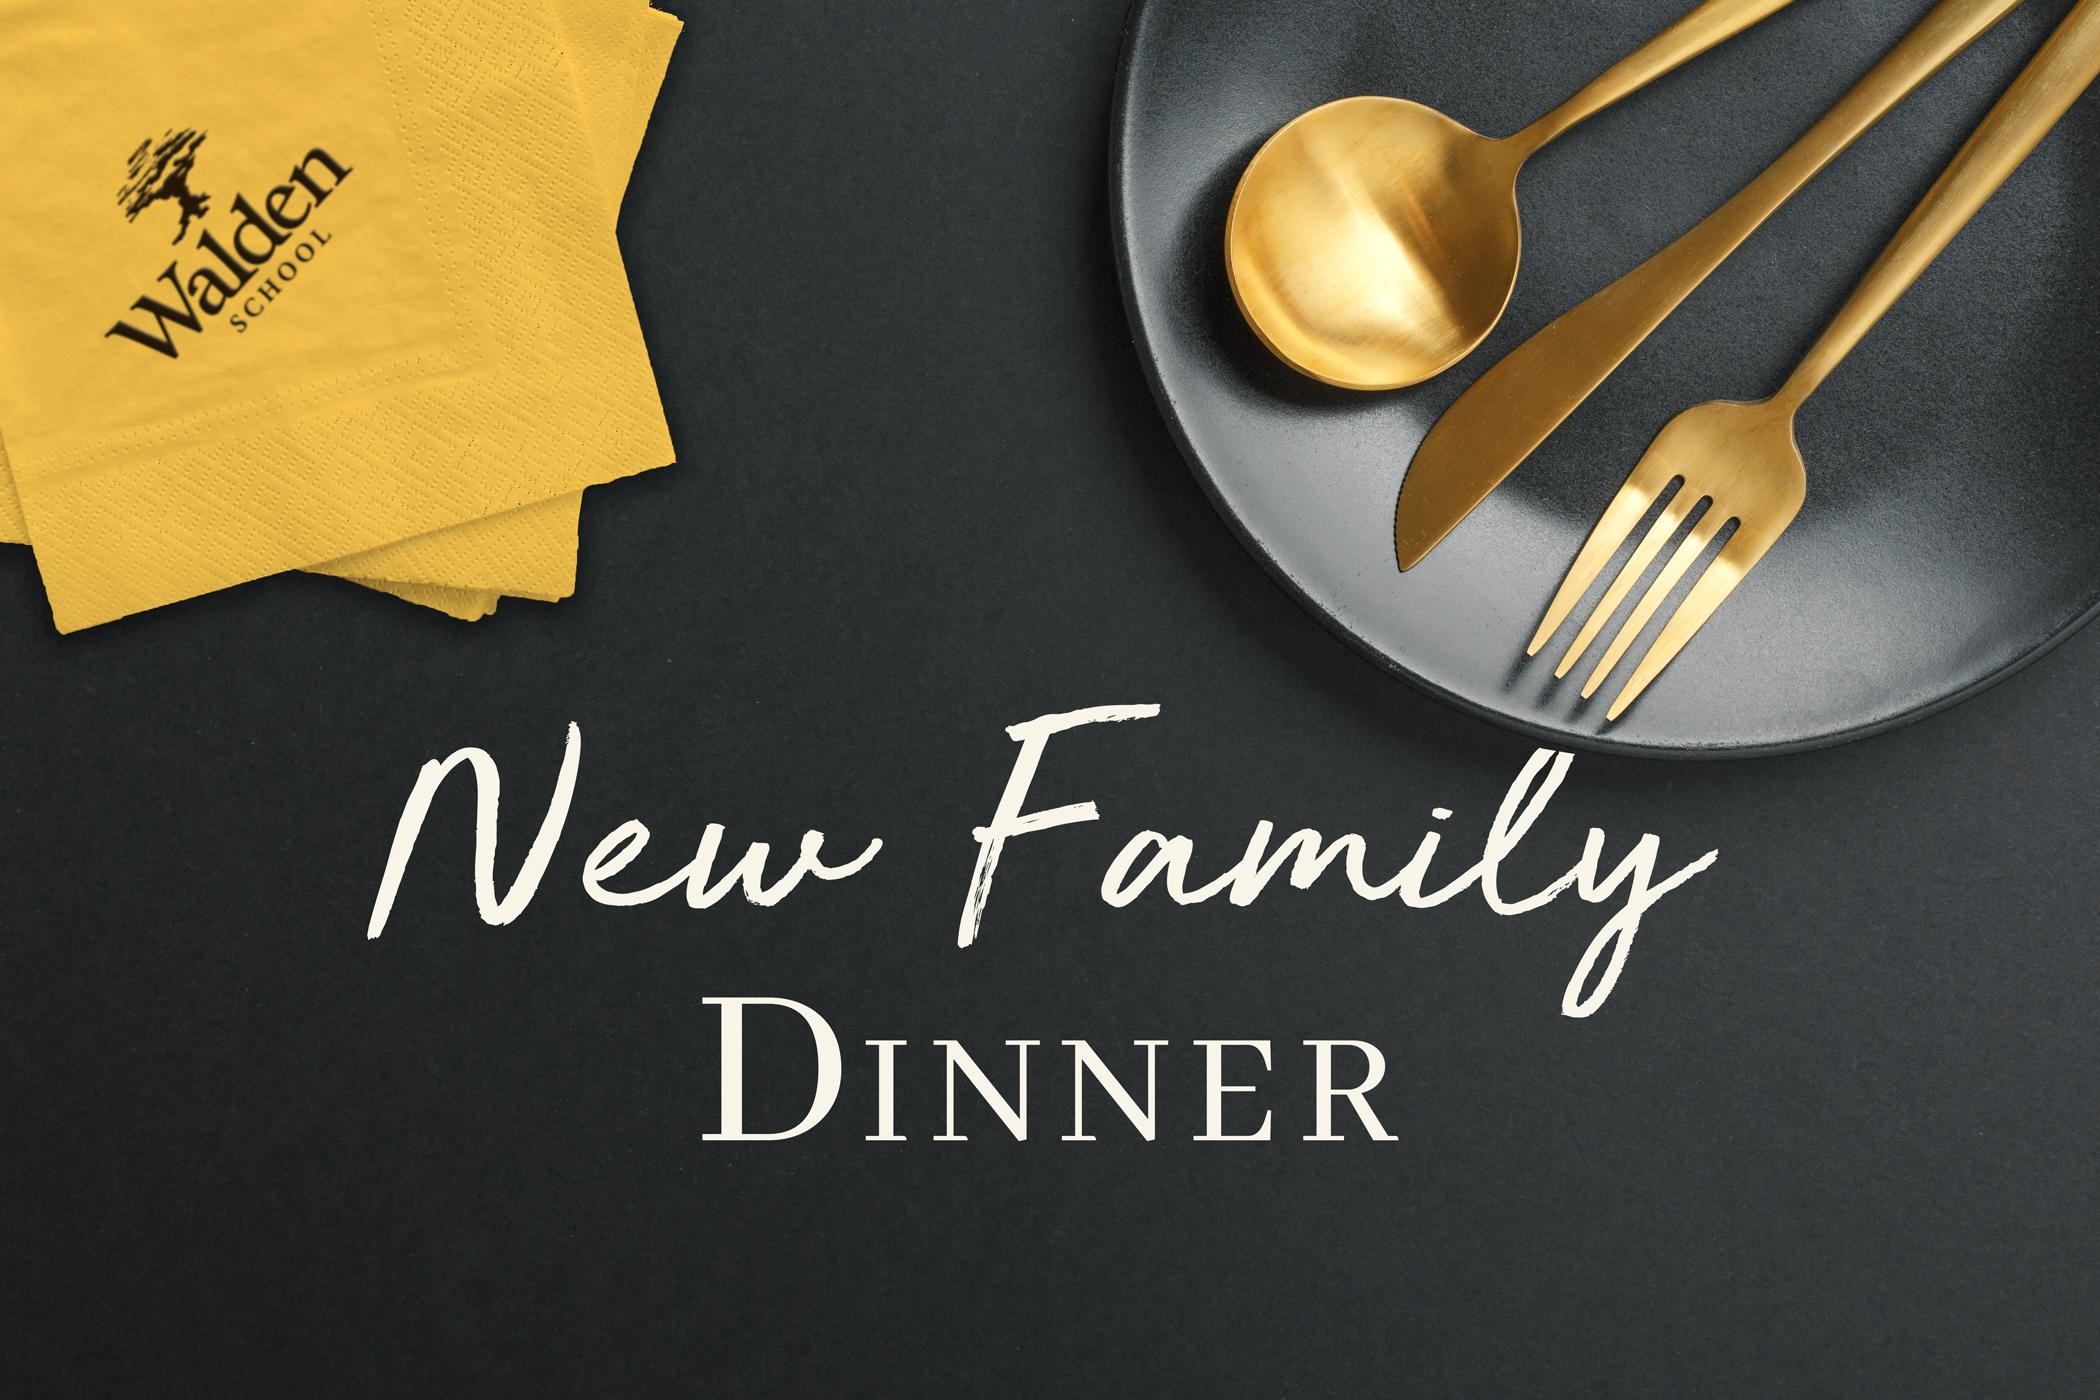 New-Parent-Dinner_2019.png